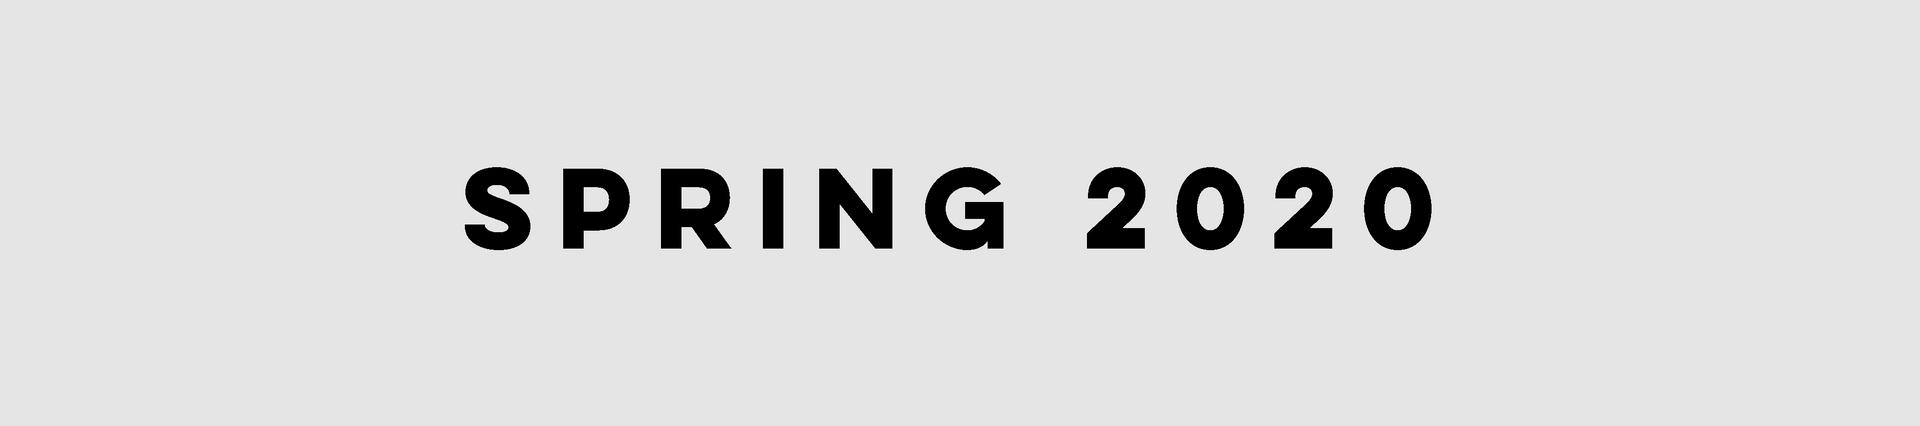 Seraphin Spring 2020